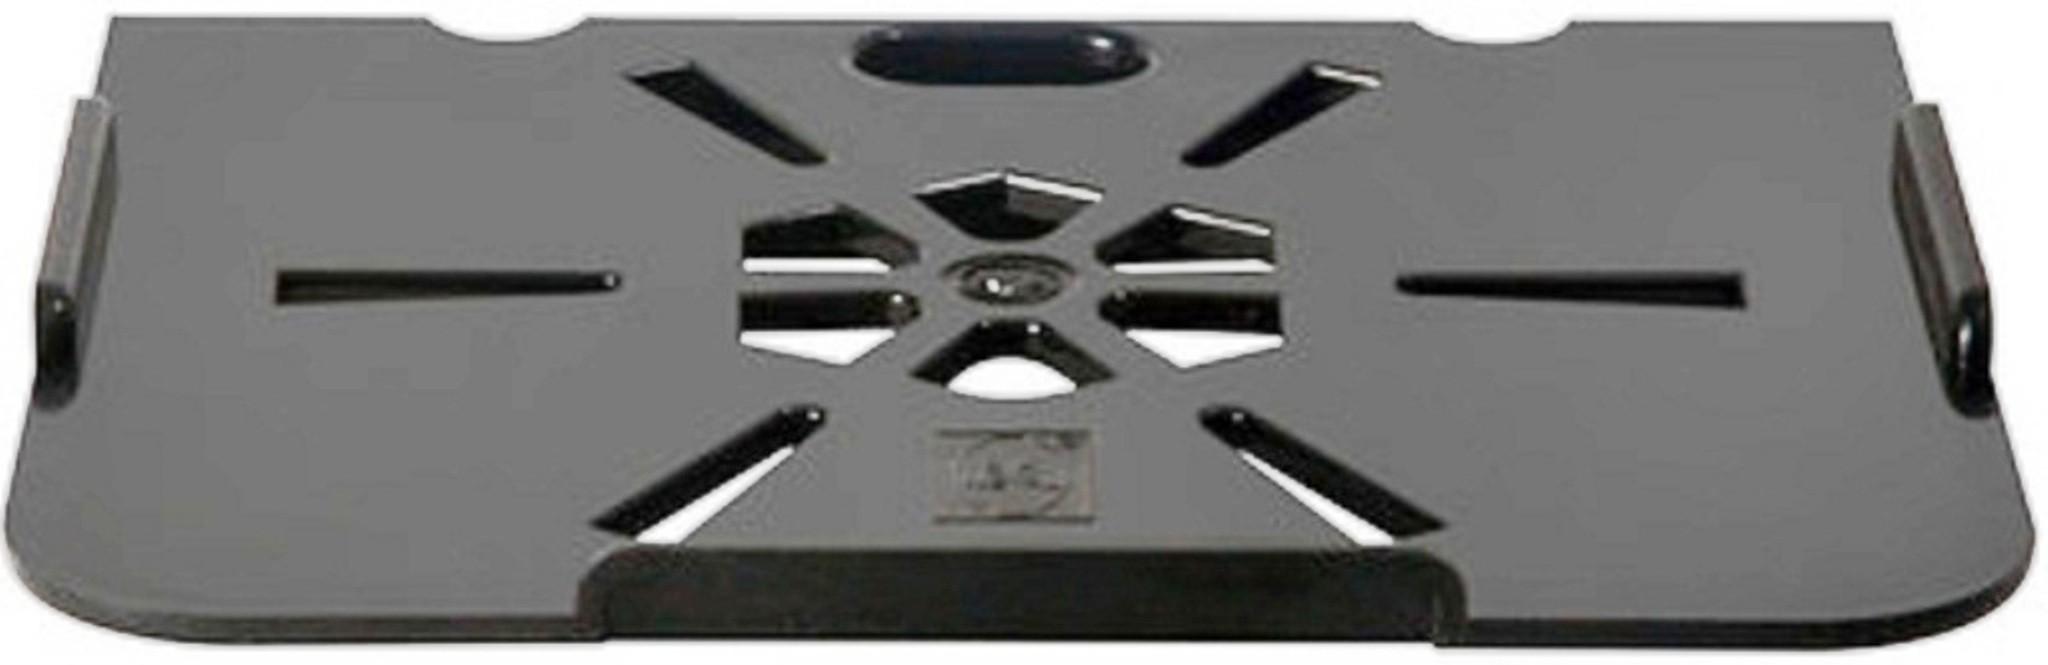 View G S Enterprise Plastic Wall Shelf(Number of Shelves - 1, Black) Furniture (G S Enterprise)